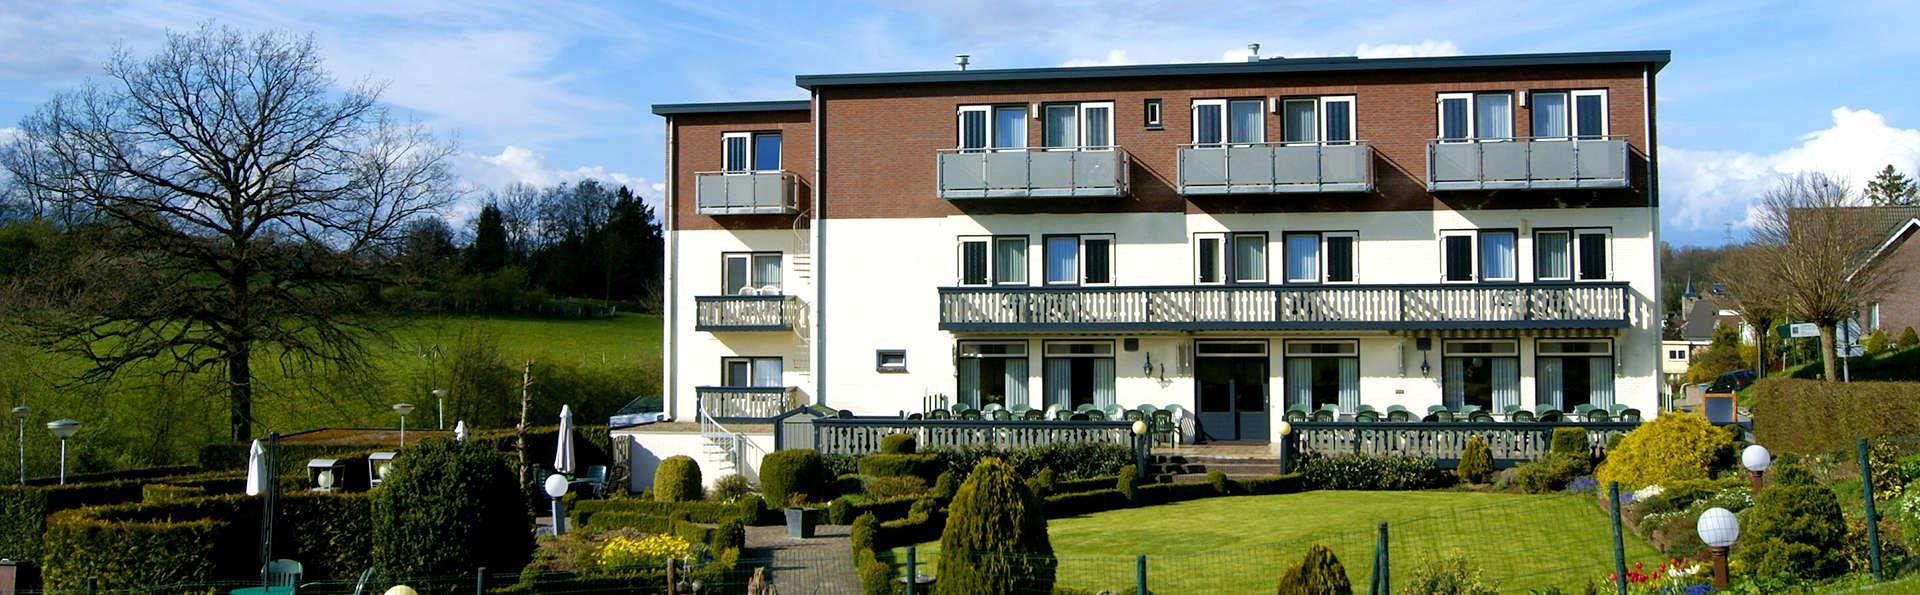 Hotel Bemelmans - EDIT_Exterior.jpg